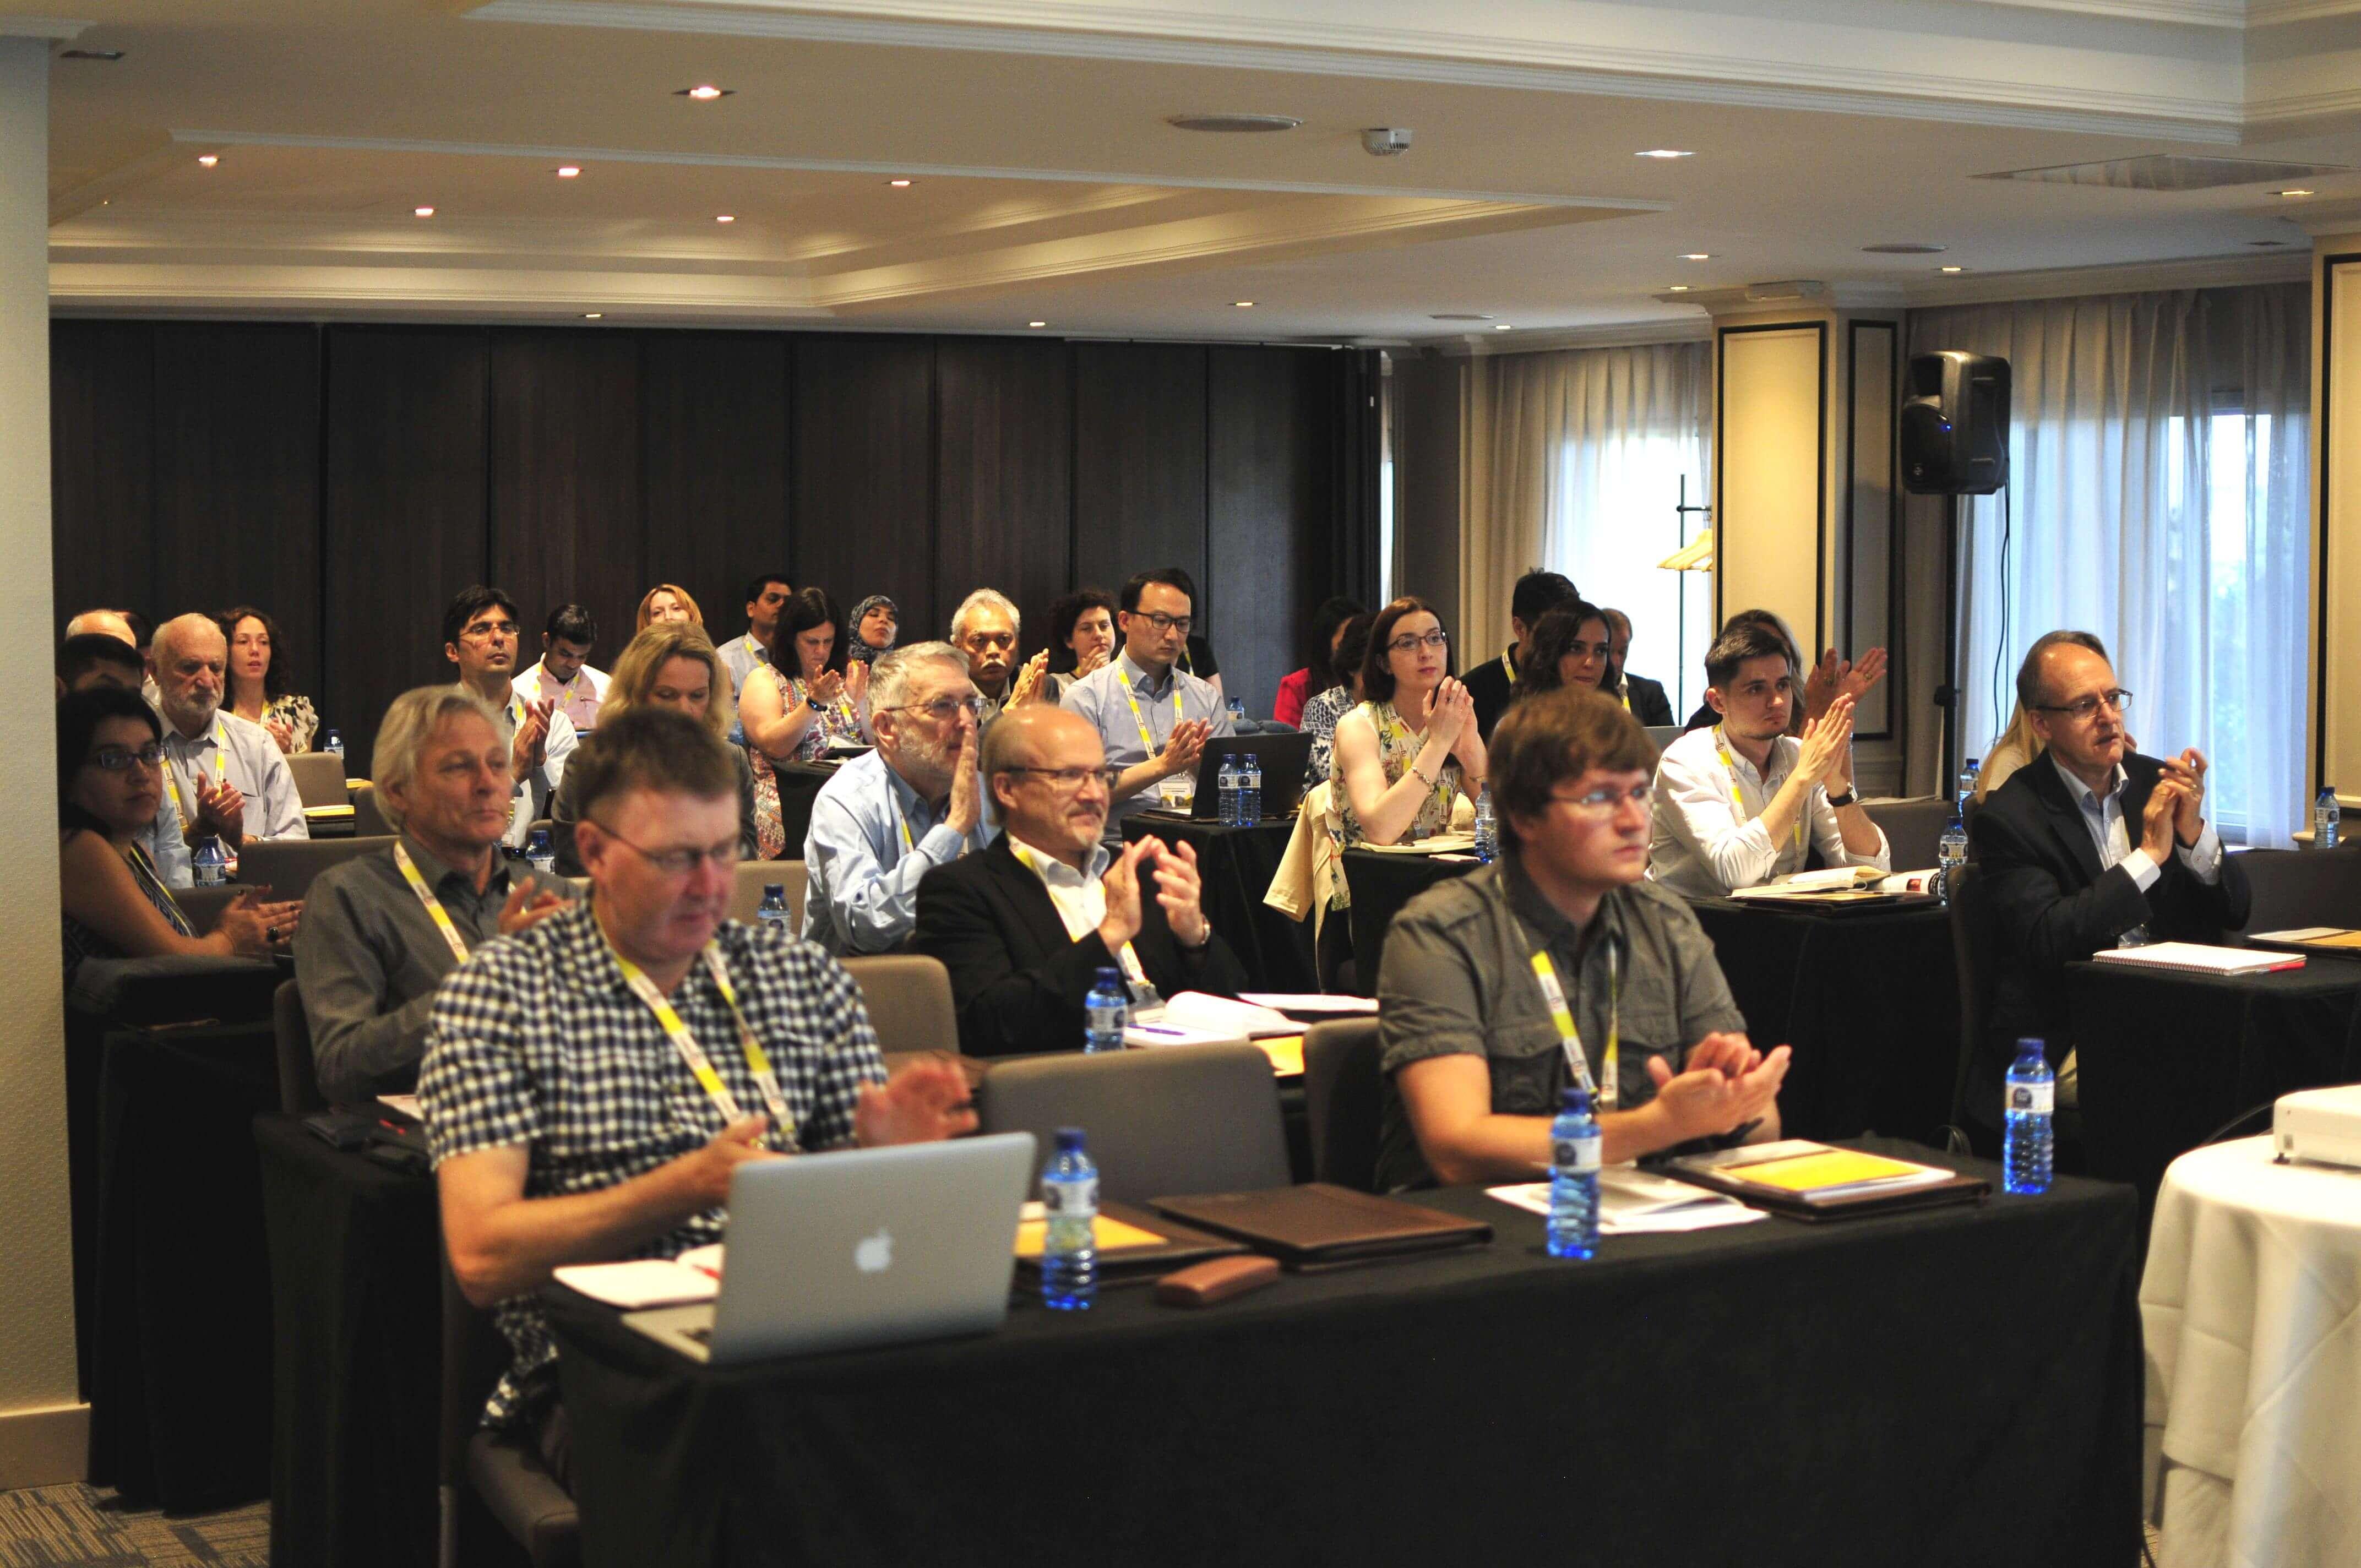 Potential speakers for Pharma 2020